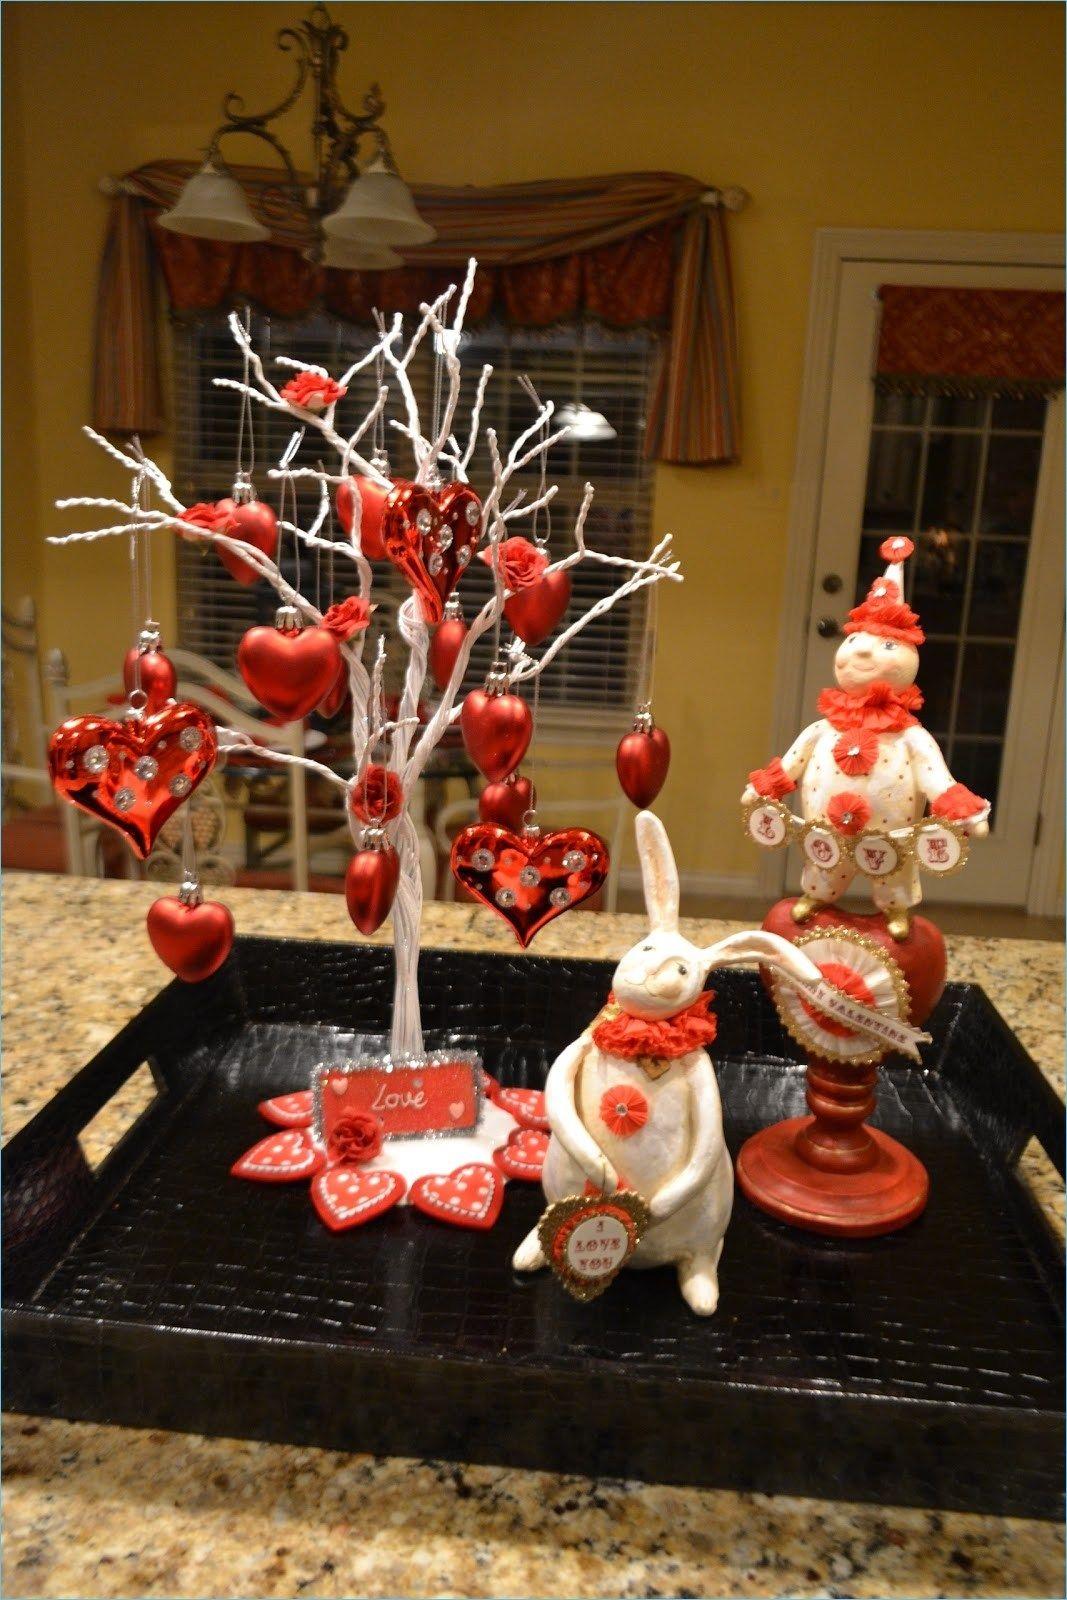 50 Amazing Valentine's Day Table Centerpiece Ideas ...